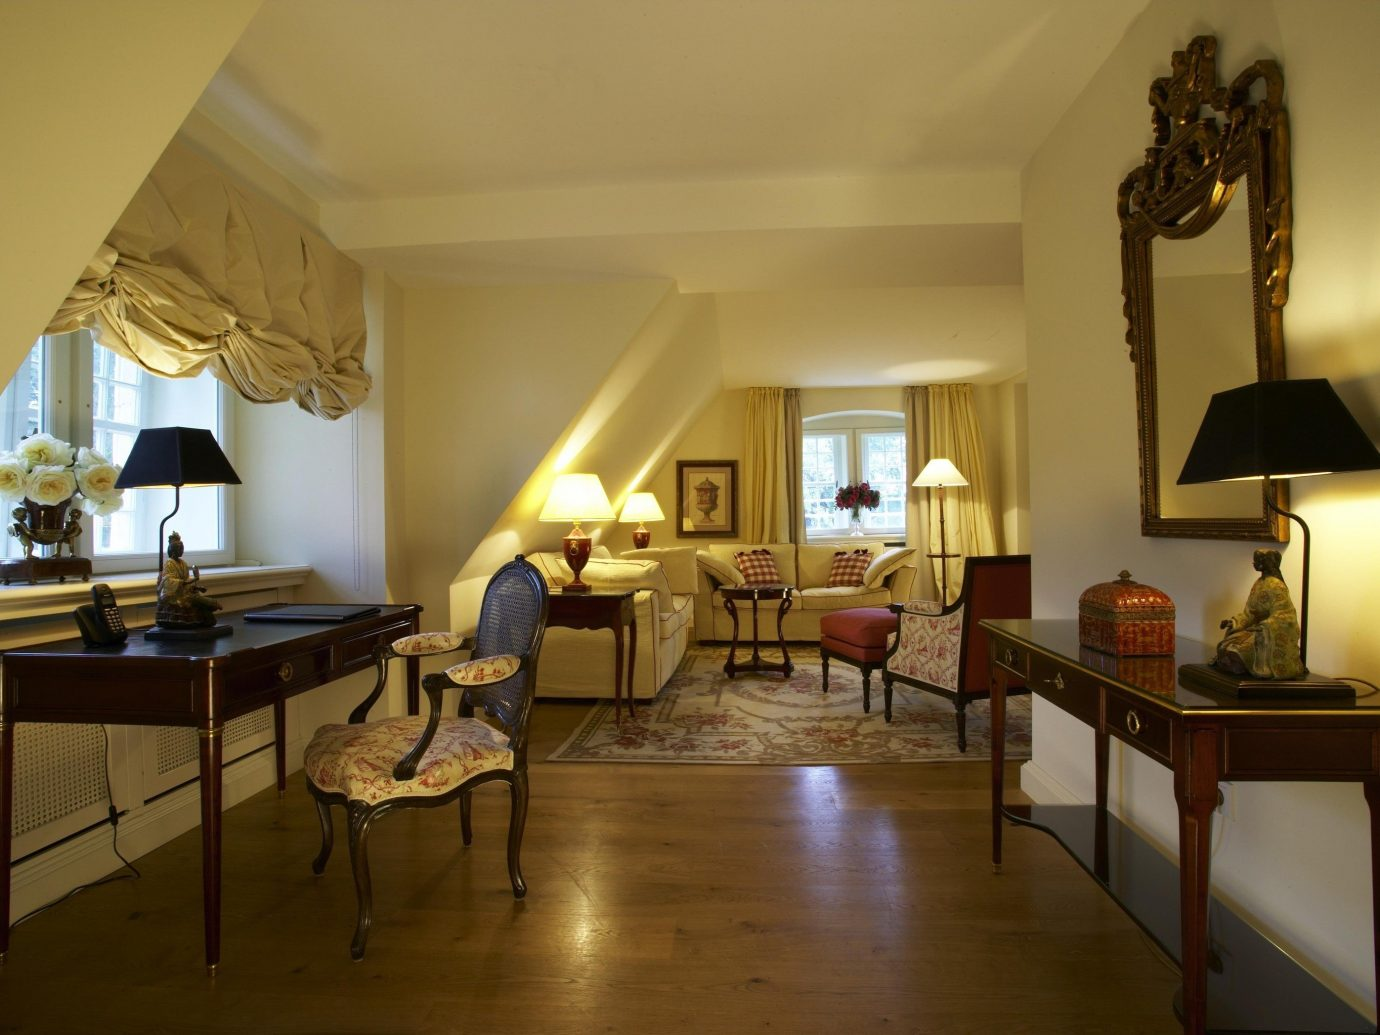 Hotels Landmarks Luxury Travel indoor floor wall room Living chair interior design Suite ceiling living room furniture real estate estate hotel window area lamp several